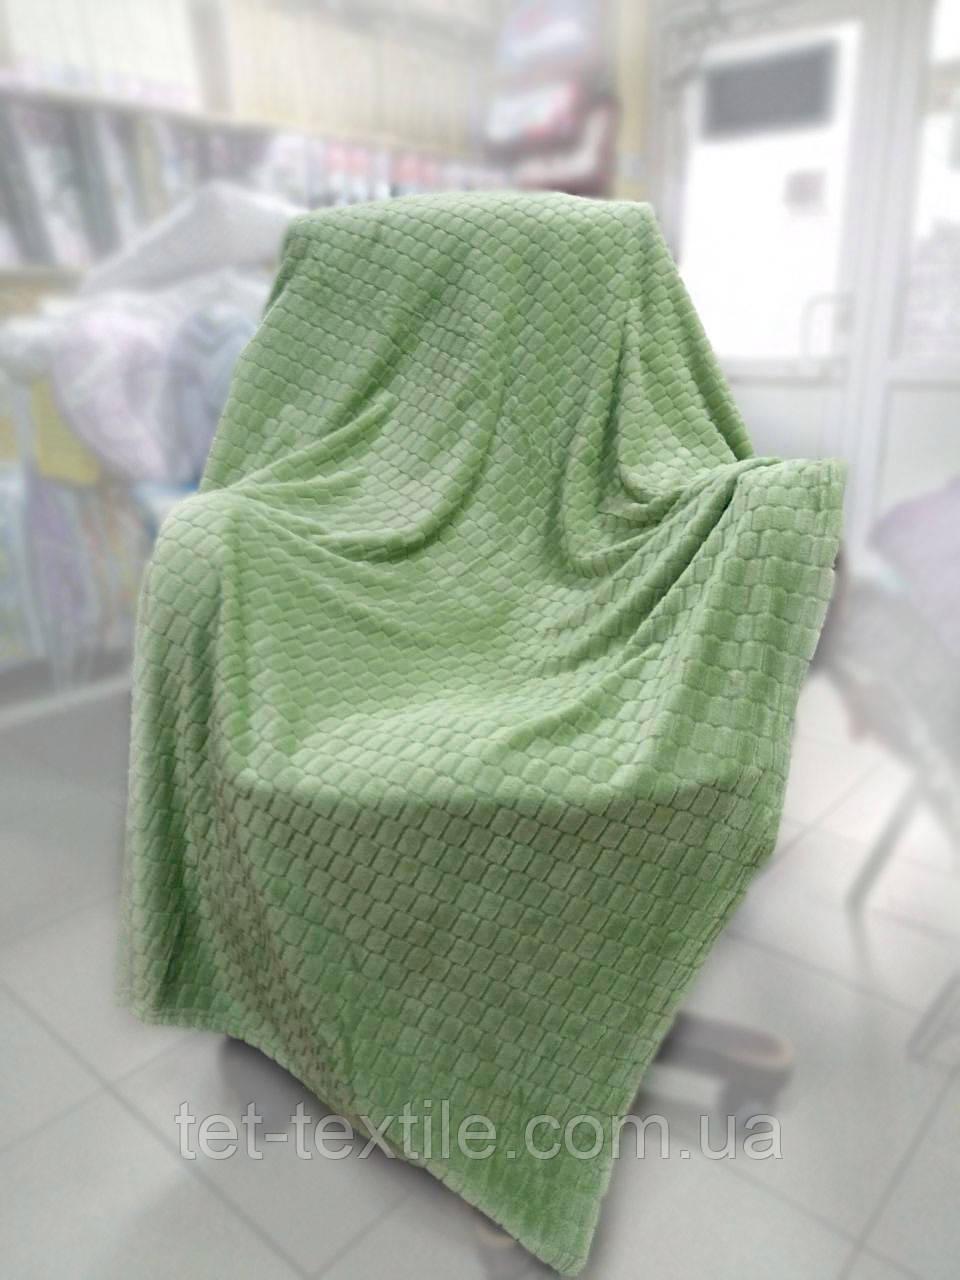 "Плед-покрывало из бамбукового волокна ""Shang Hay"" Кубики оливка (200x230cм.)"